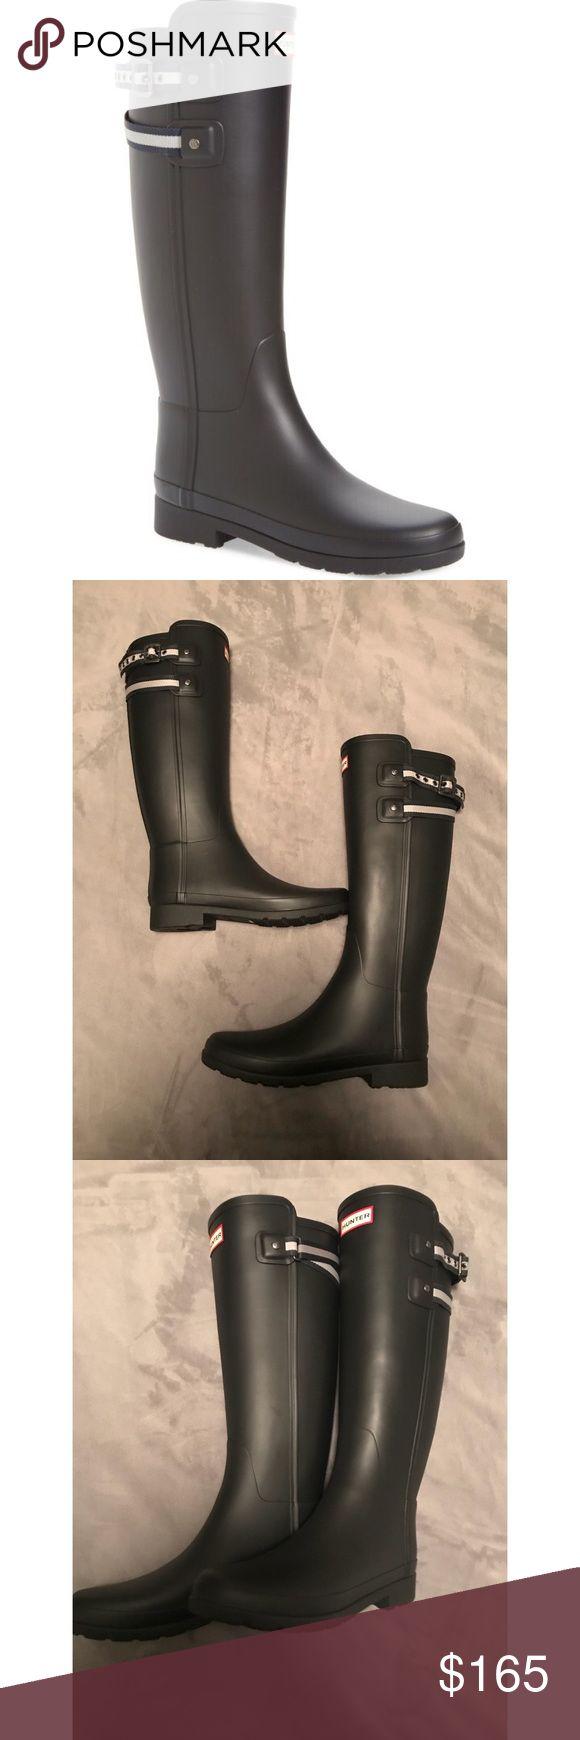 Hunter Refined Tall Black Matte Rain Boots Size 9 Brand new, in shoe box (missing shoe box lid). Hunter Shoes Winter & Rain Boots